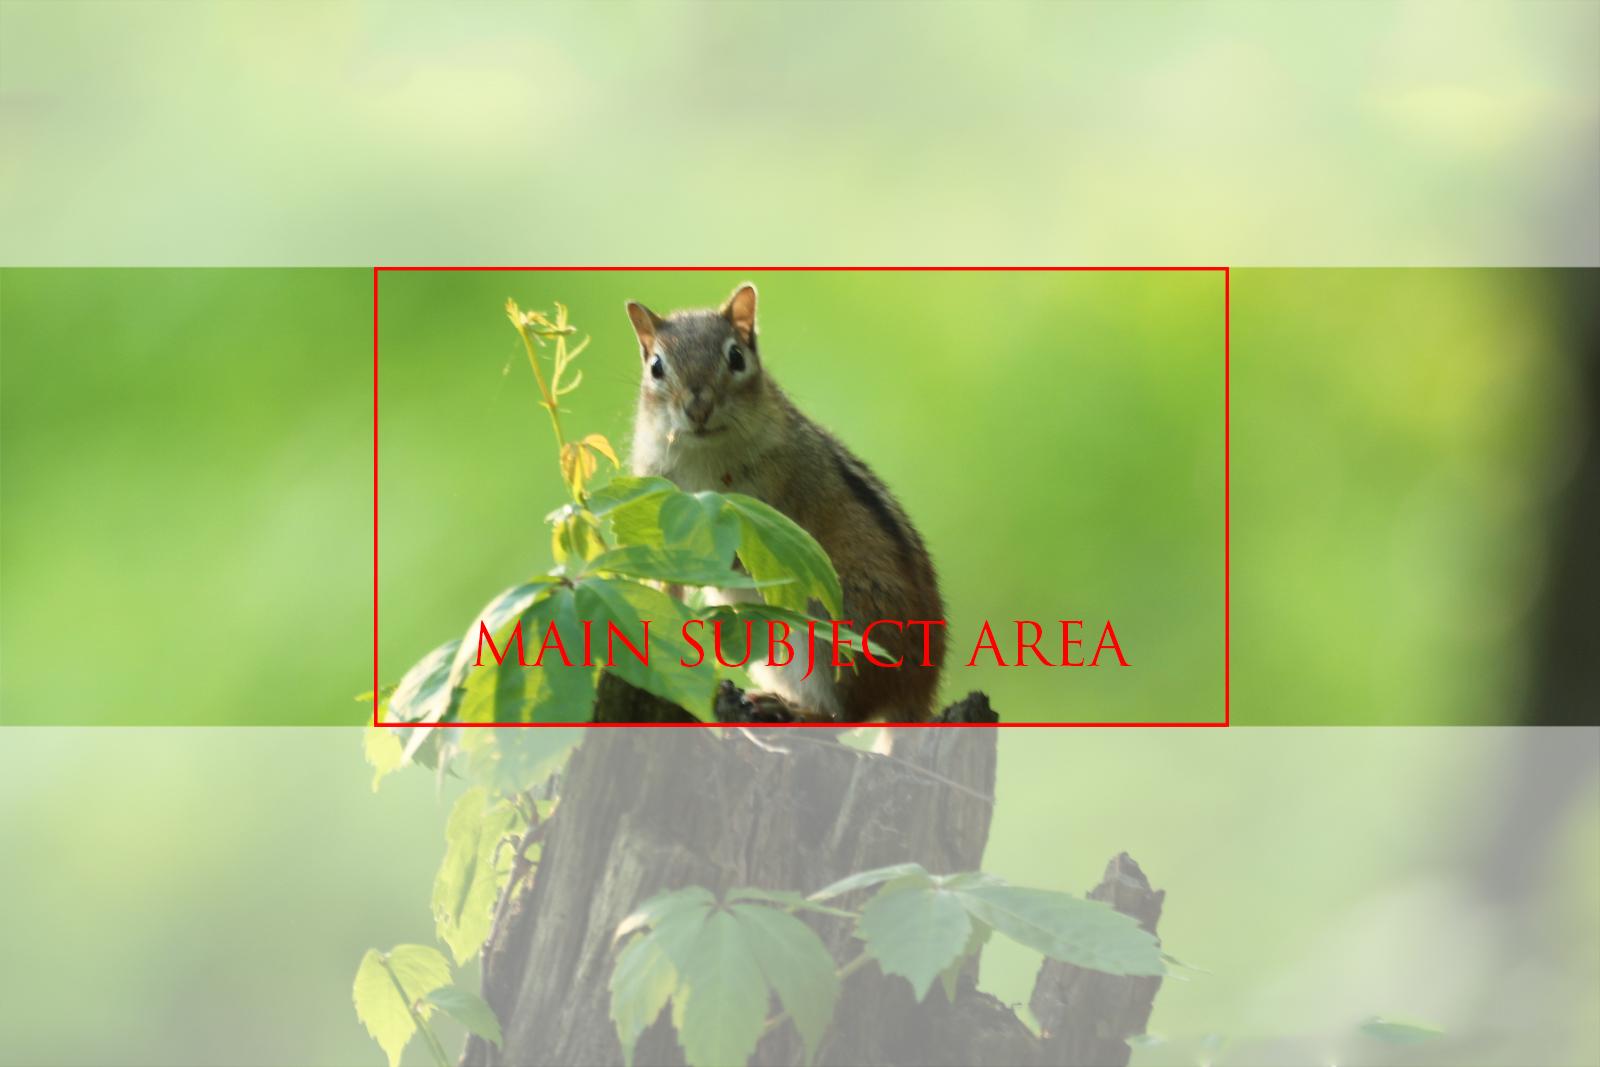 banner-shot-orientation-aspect-ratio3.jpg